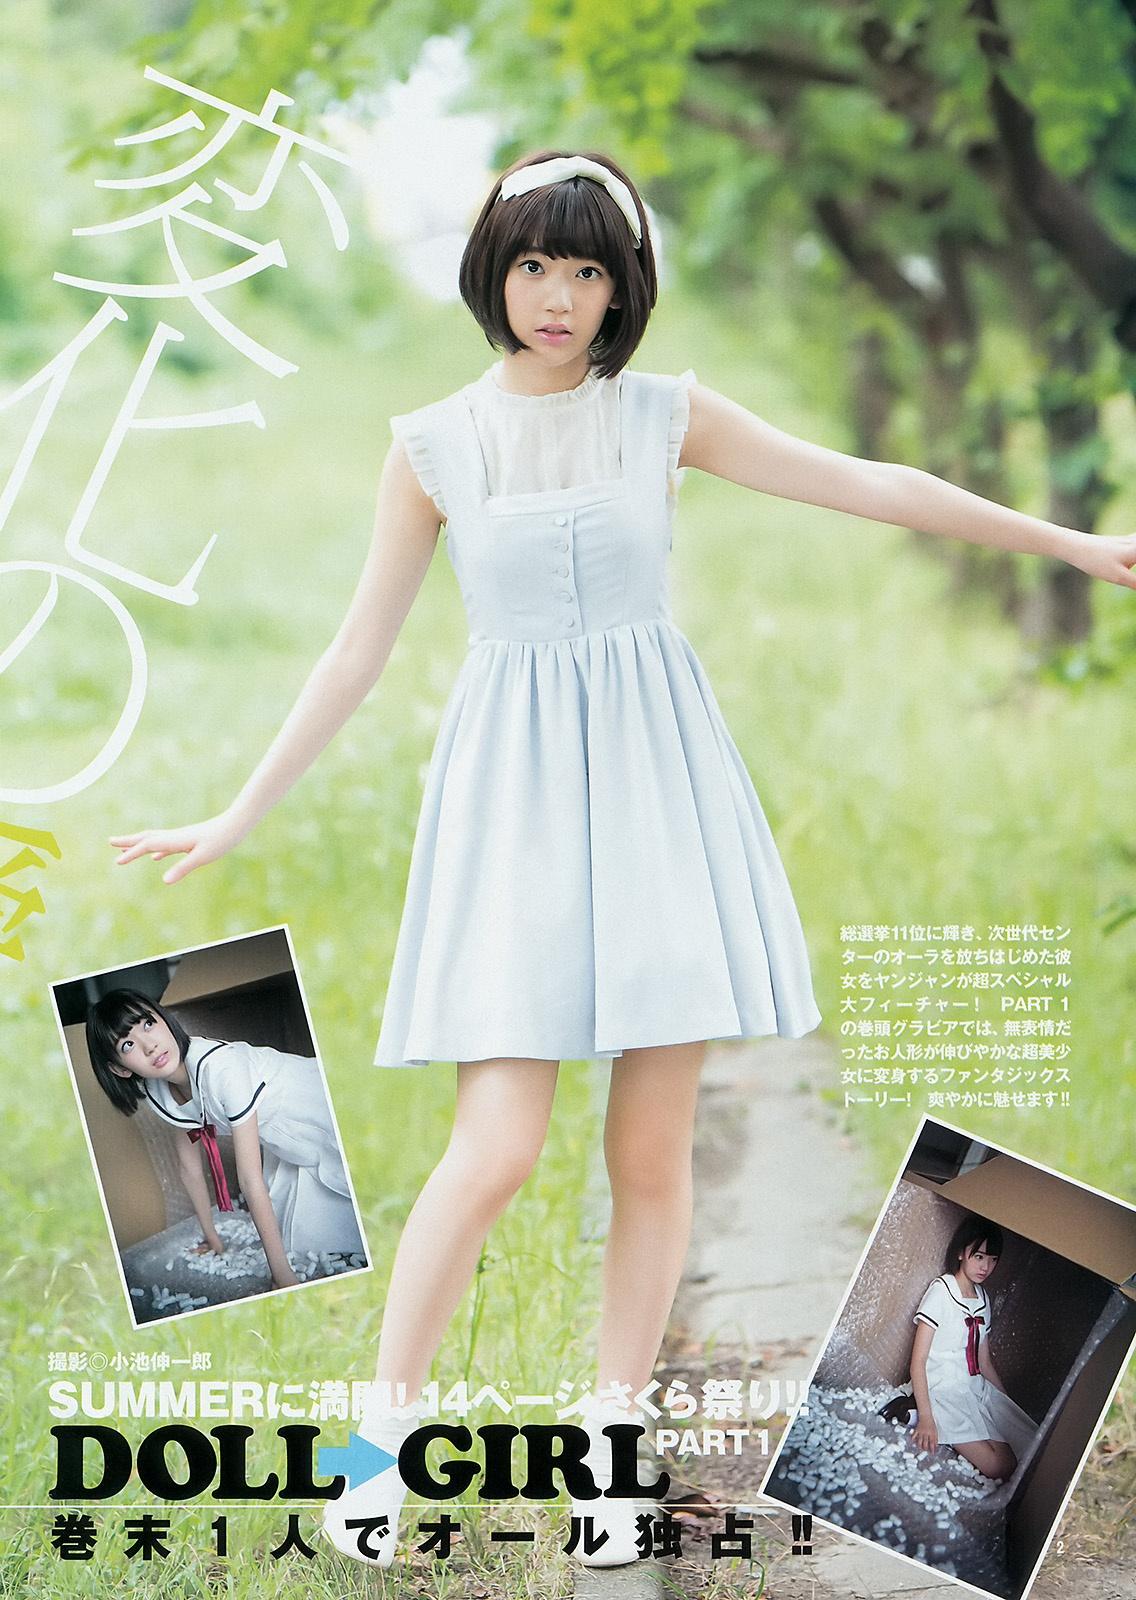 Miyawaki Sakura Android Iphone Wallpaper 1548 Asiachan Kpop Image